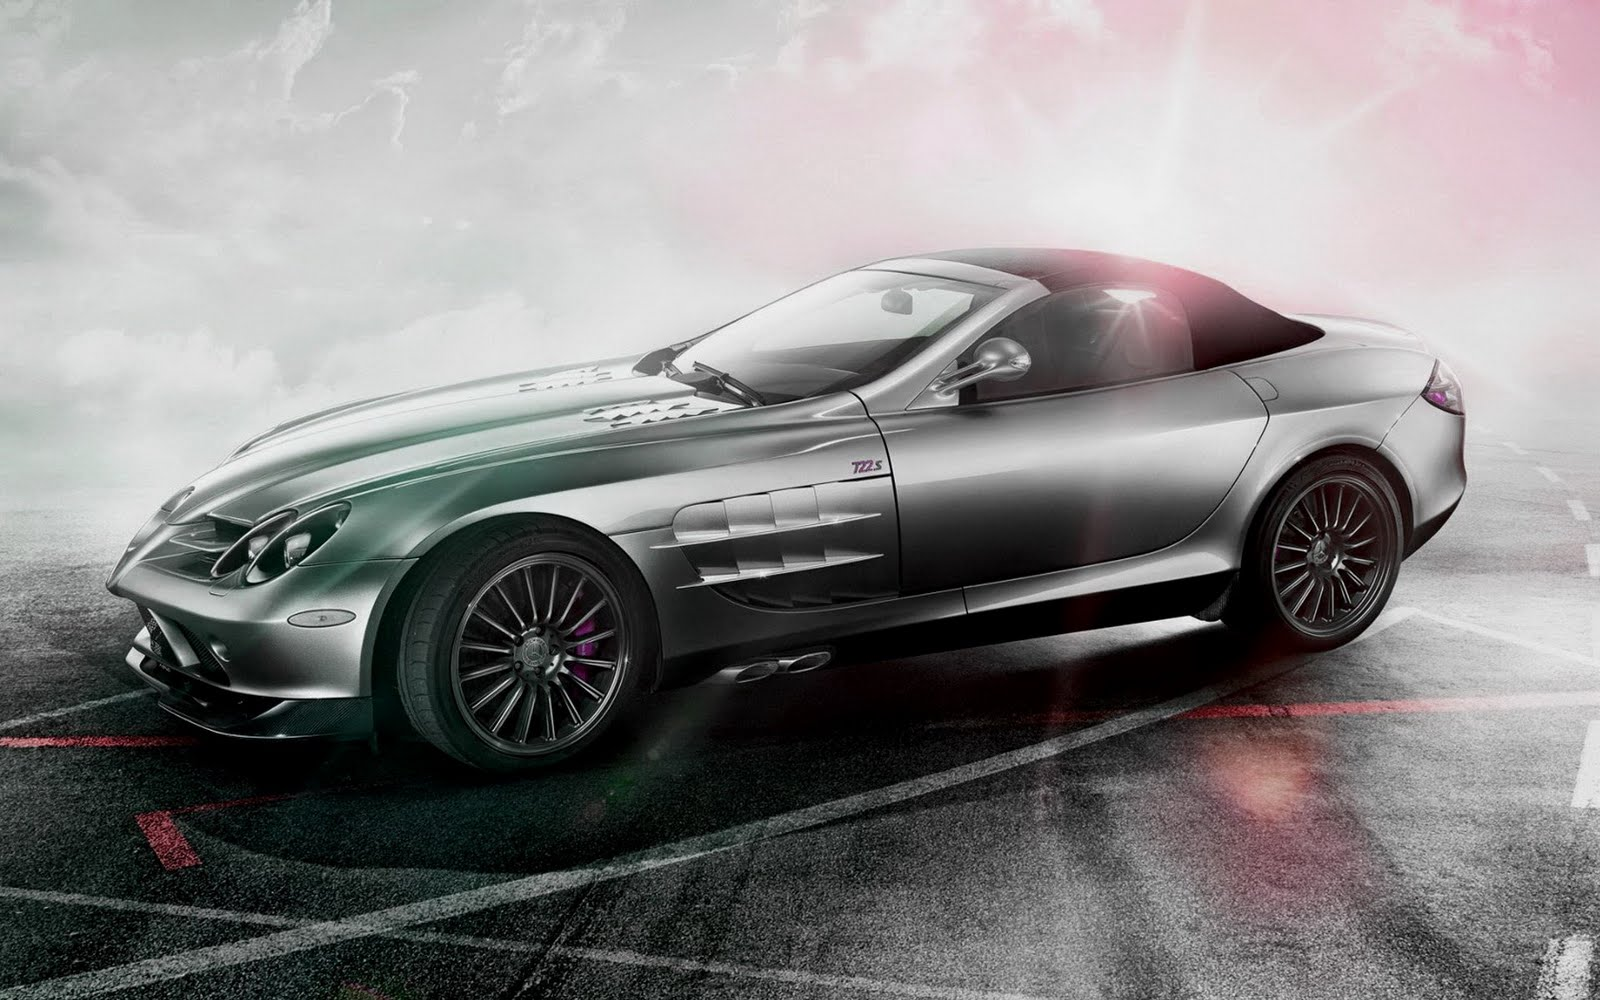 http://4.bp.blogspot.com/_aIrU_NInAww/S96iPz_8YeI/AAAAAAAAAKs/Sfsiz9K9C8g/s1600/laba.ws_New_Cars_HD_+0014.jpg